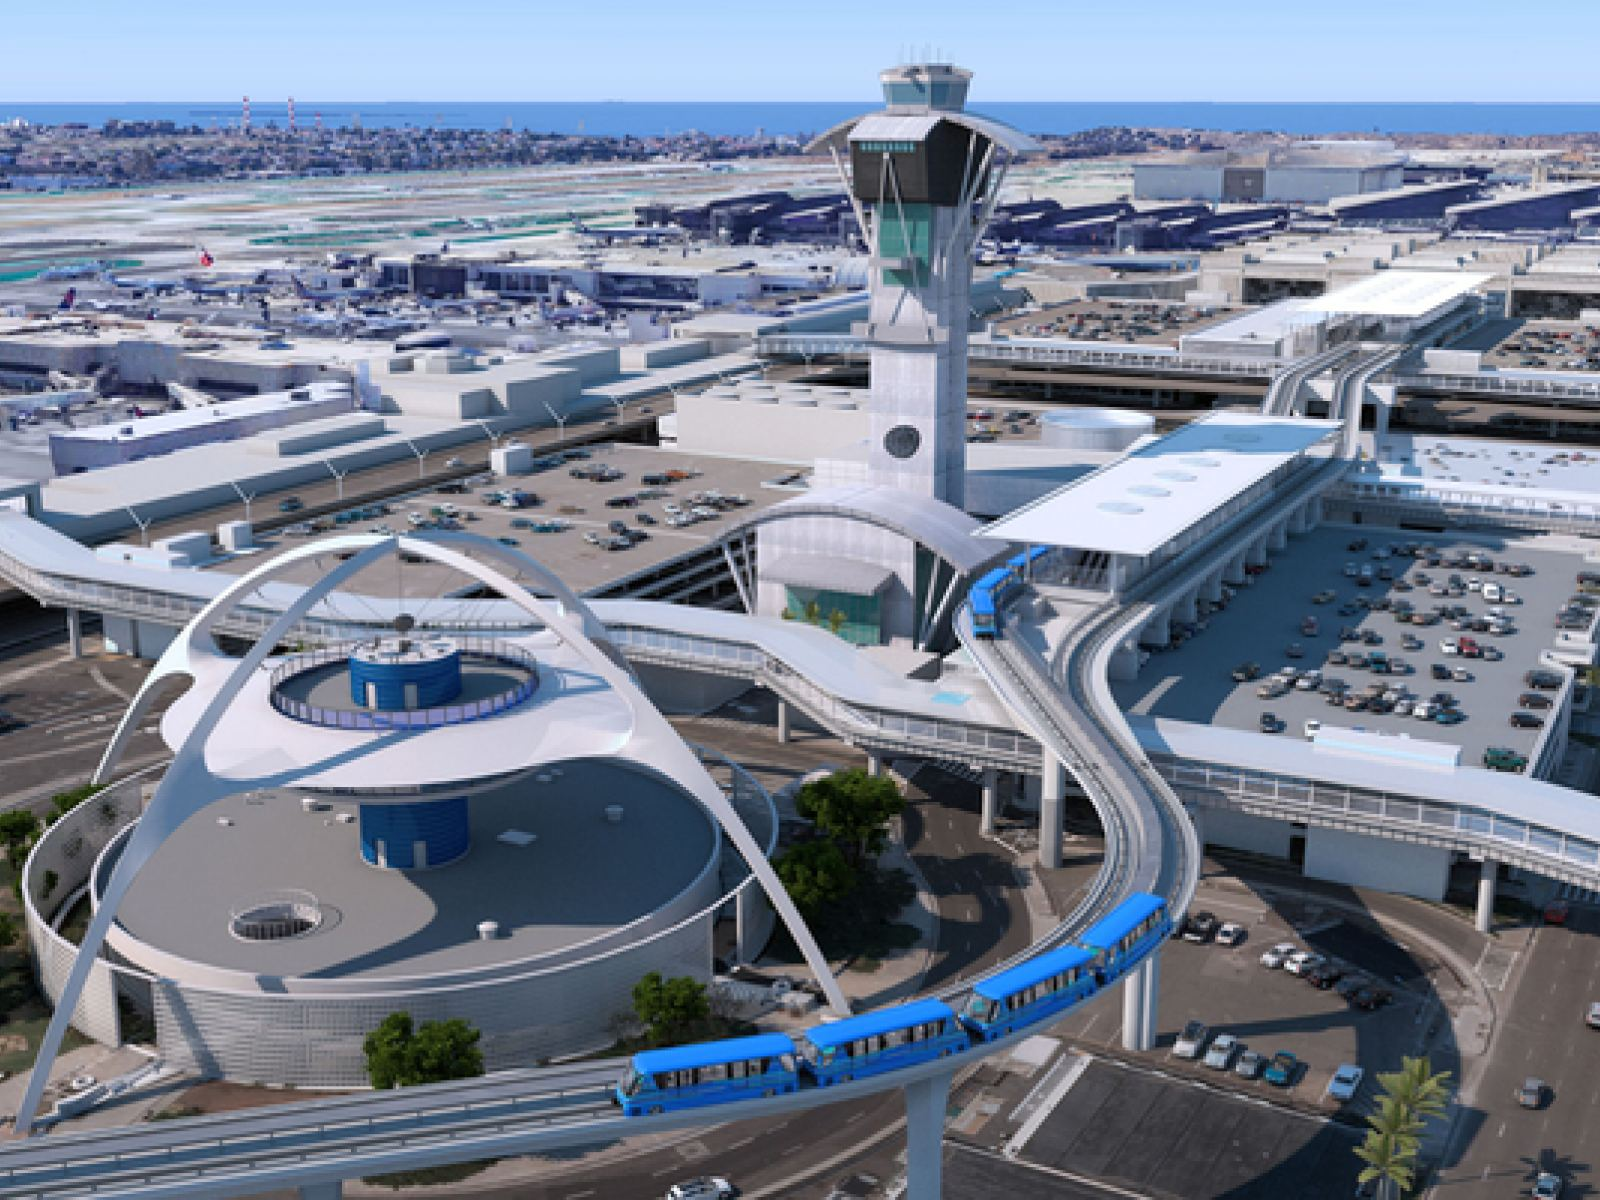 Main image for article titled Futurama: Descubra o Novo do Aeroporto Internacional de Los Angeles (LAX)